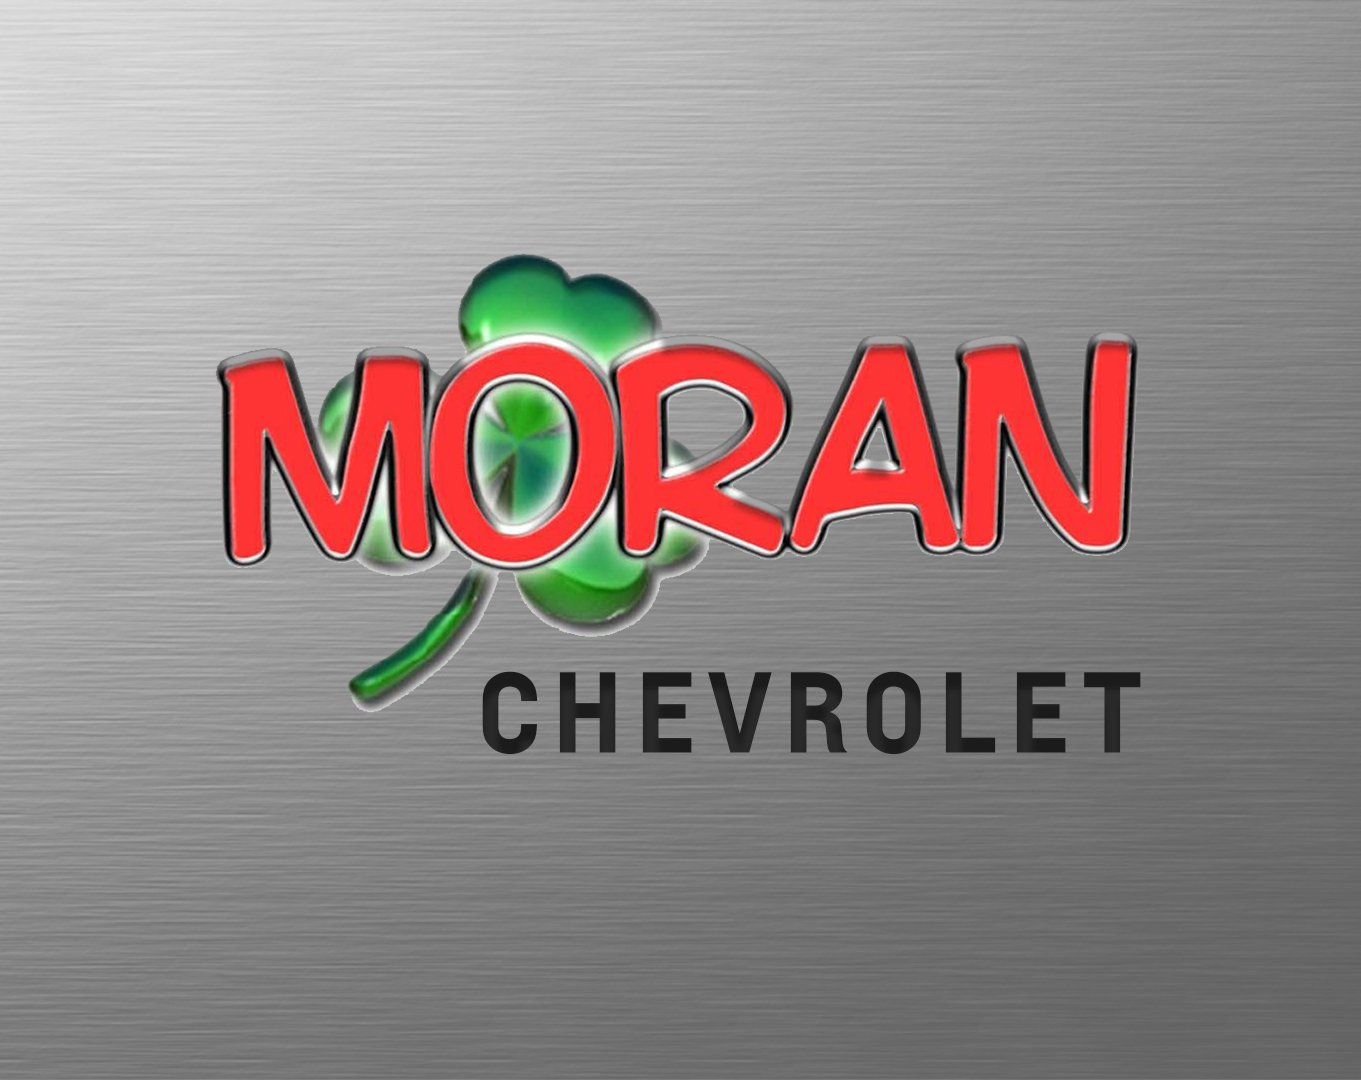 Moran Chevrolet (@moranchevrolet) | Twitter | moran chevrolet